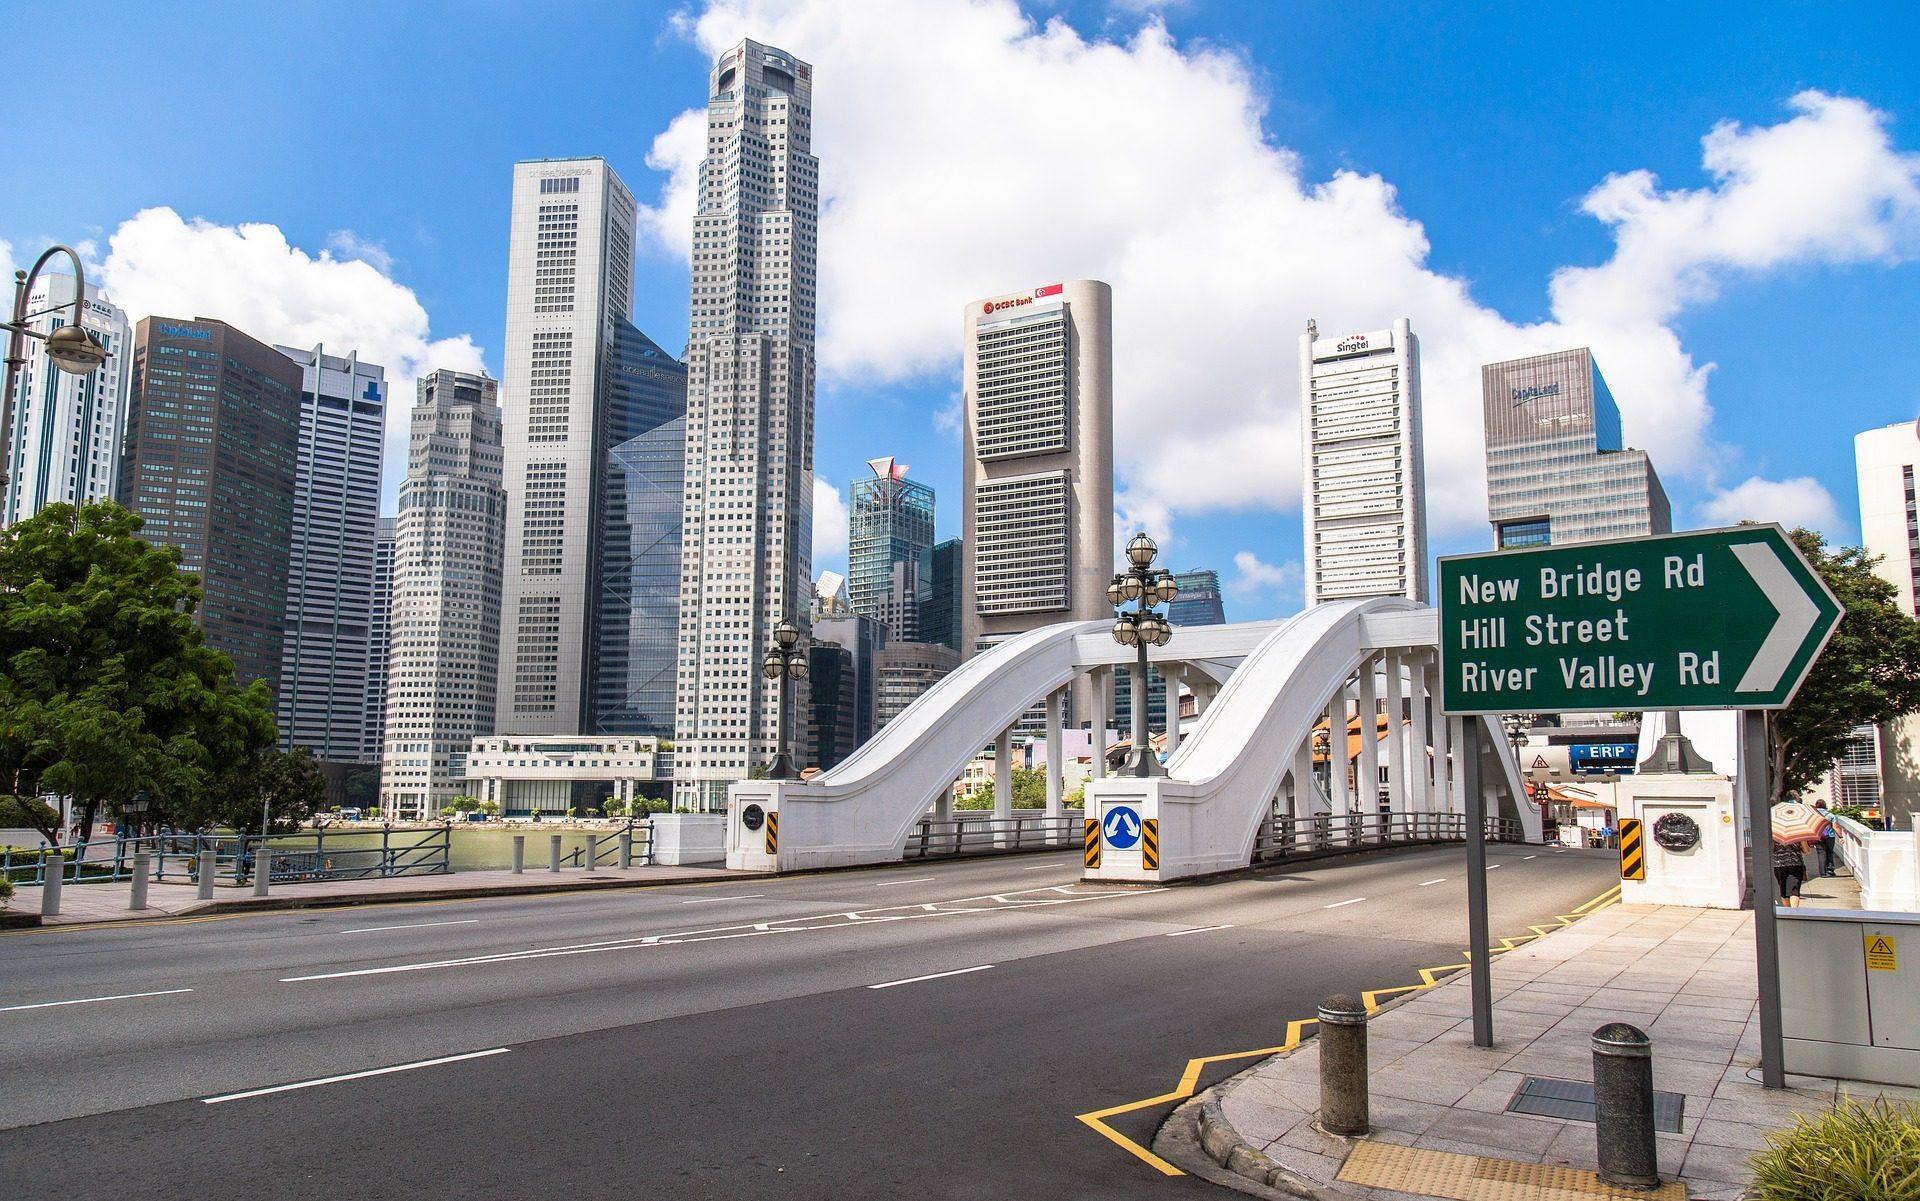 Città, edifici, grattacielo, Ponte, Skyline, Singapore - Sfondi HD - Professor-falken.com